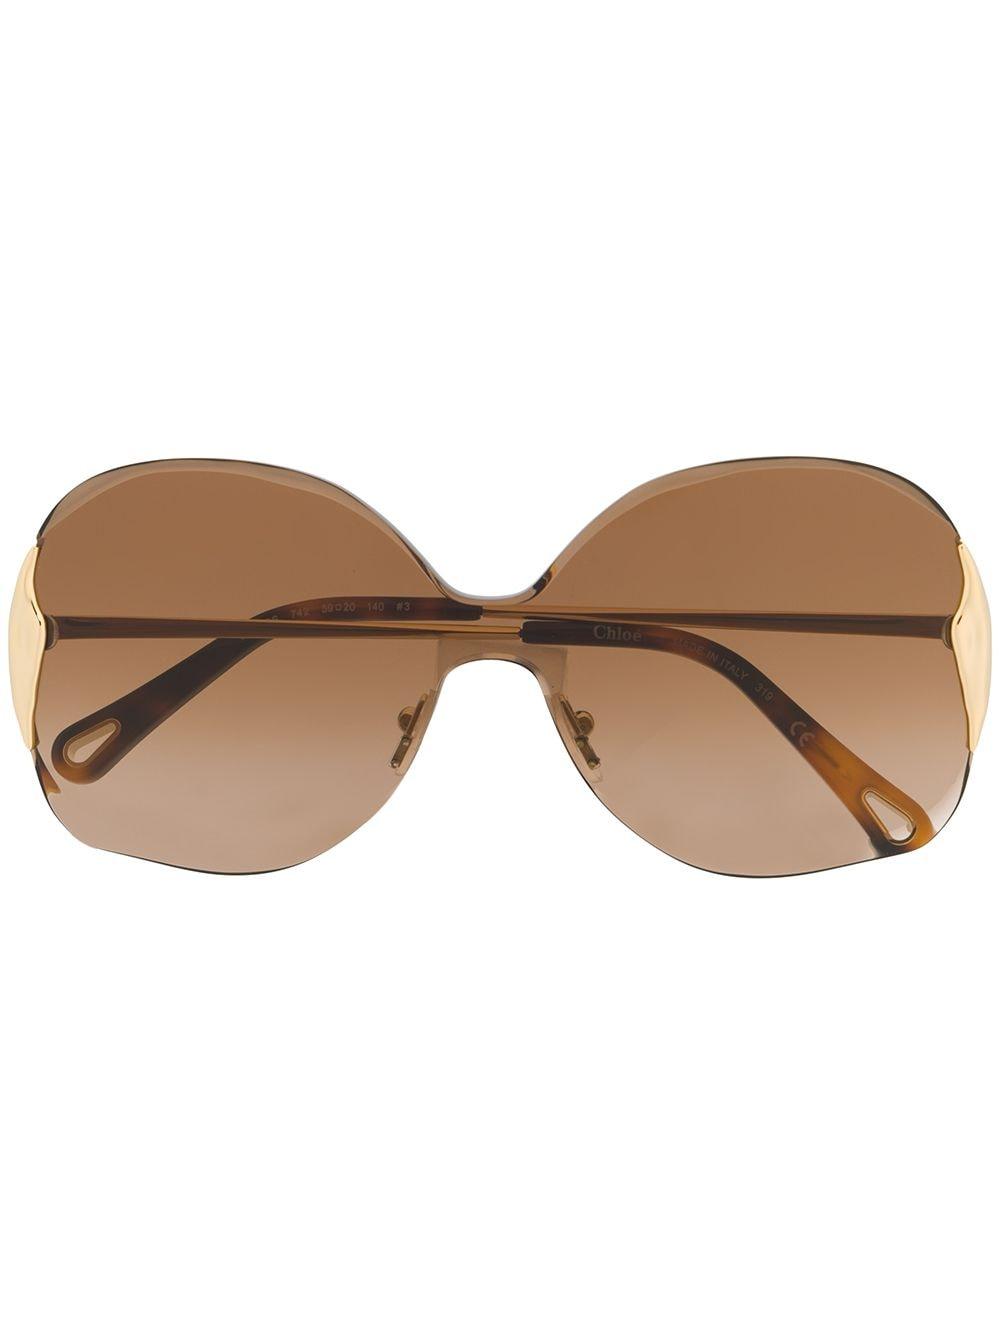 Chloé 'Curtis' Oversized-Sonnenbrille - Gold